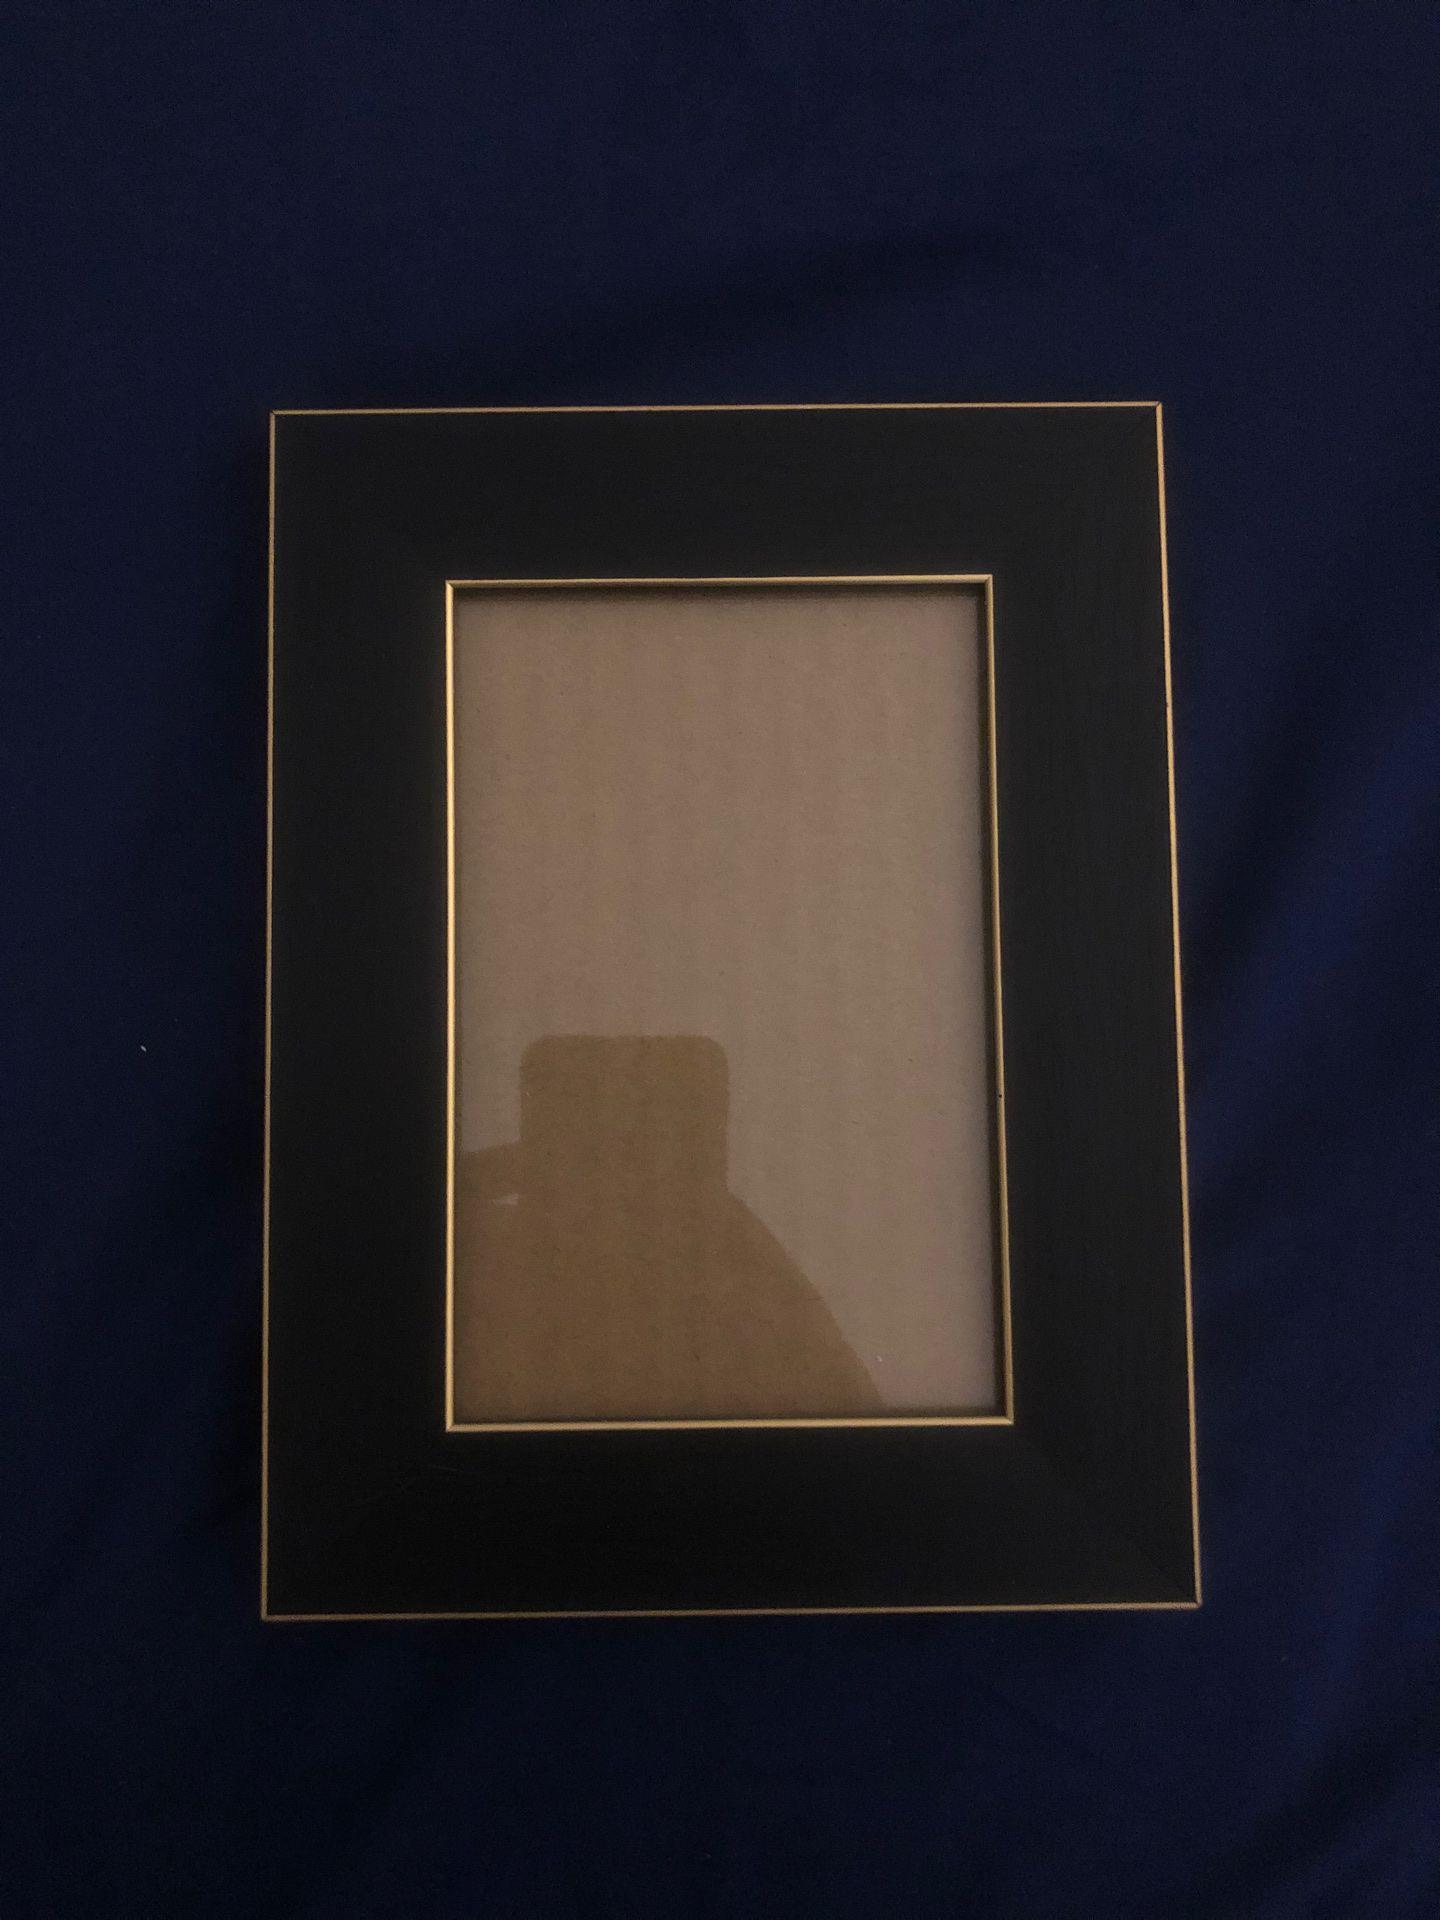 Frame, black and gold